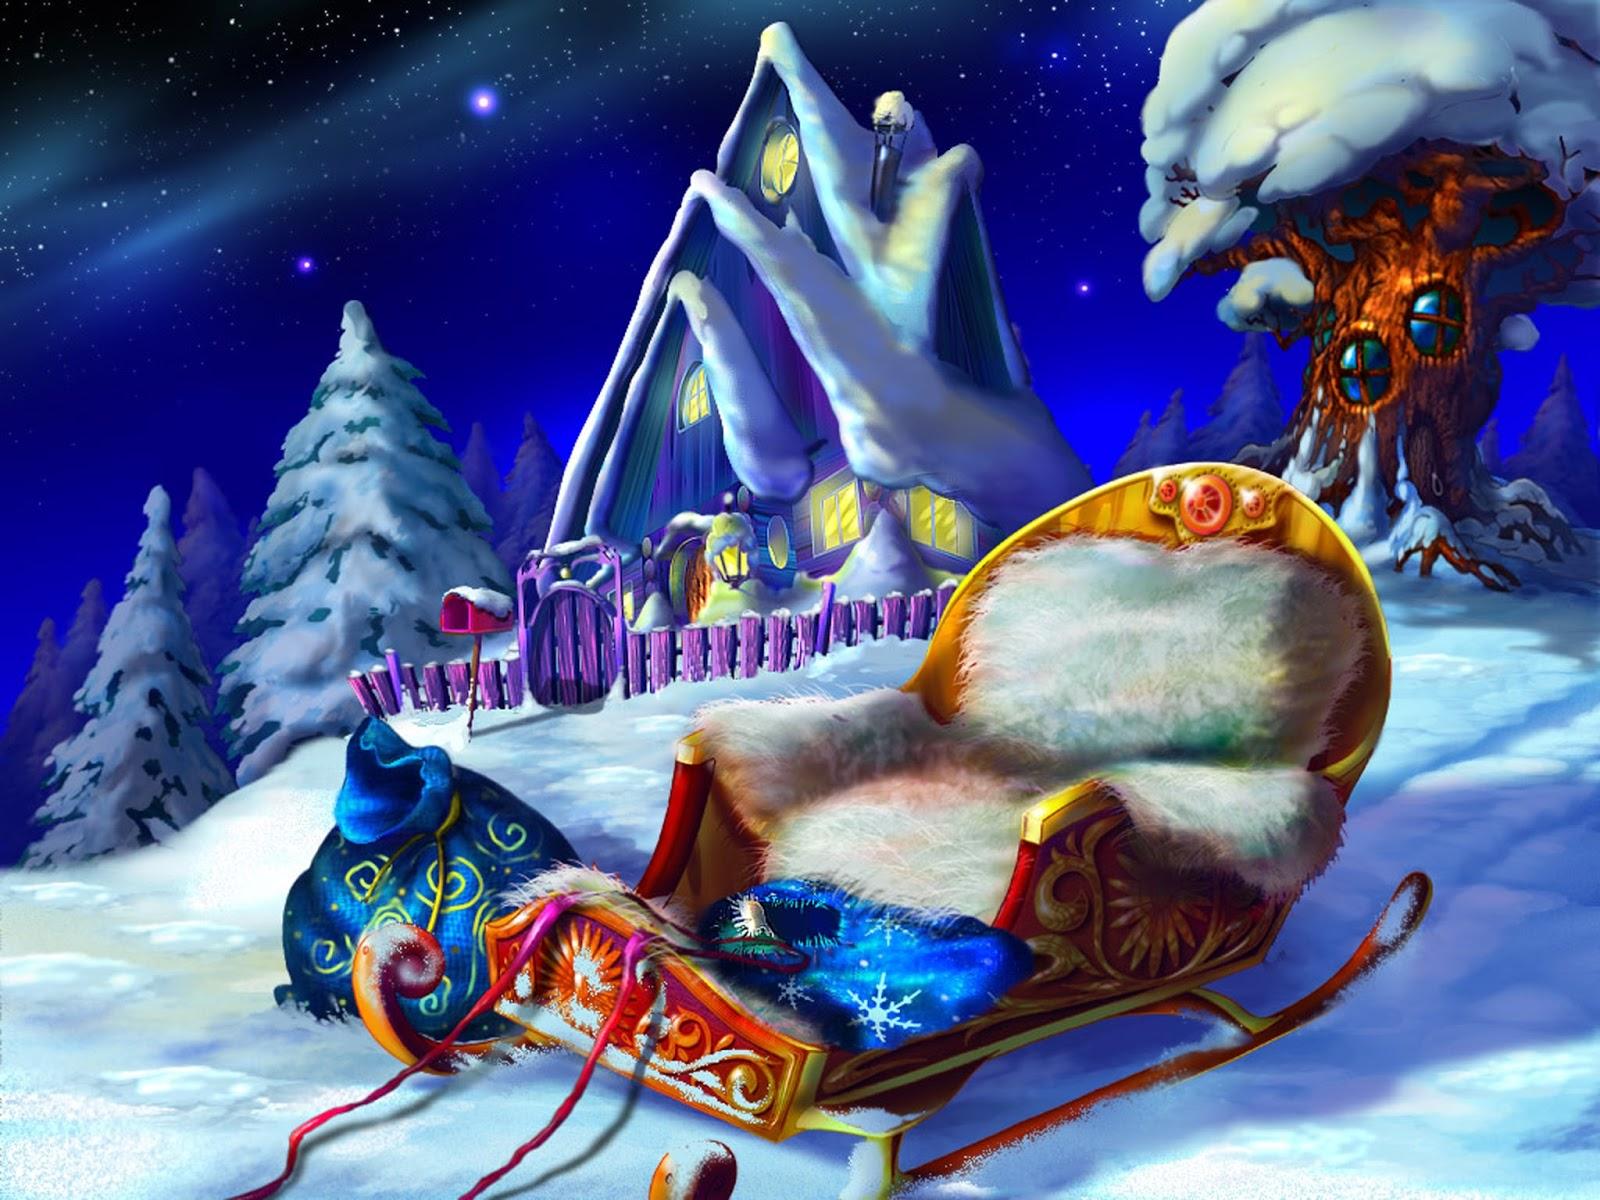 Fondo De Pantalla 3d De Navidad De Santa Vas De Luna Hd: Fondo De Pantalla Navidad Trineo De Santa Claus